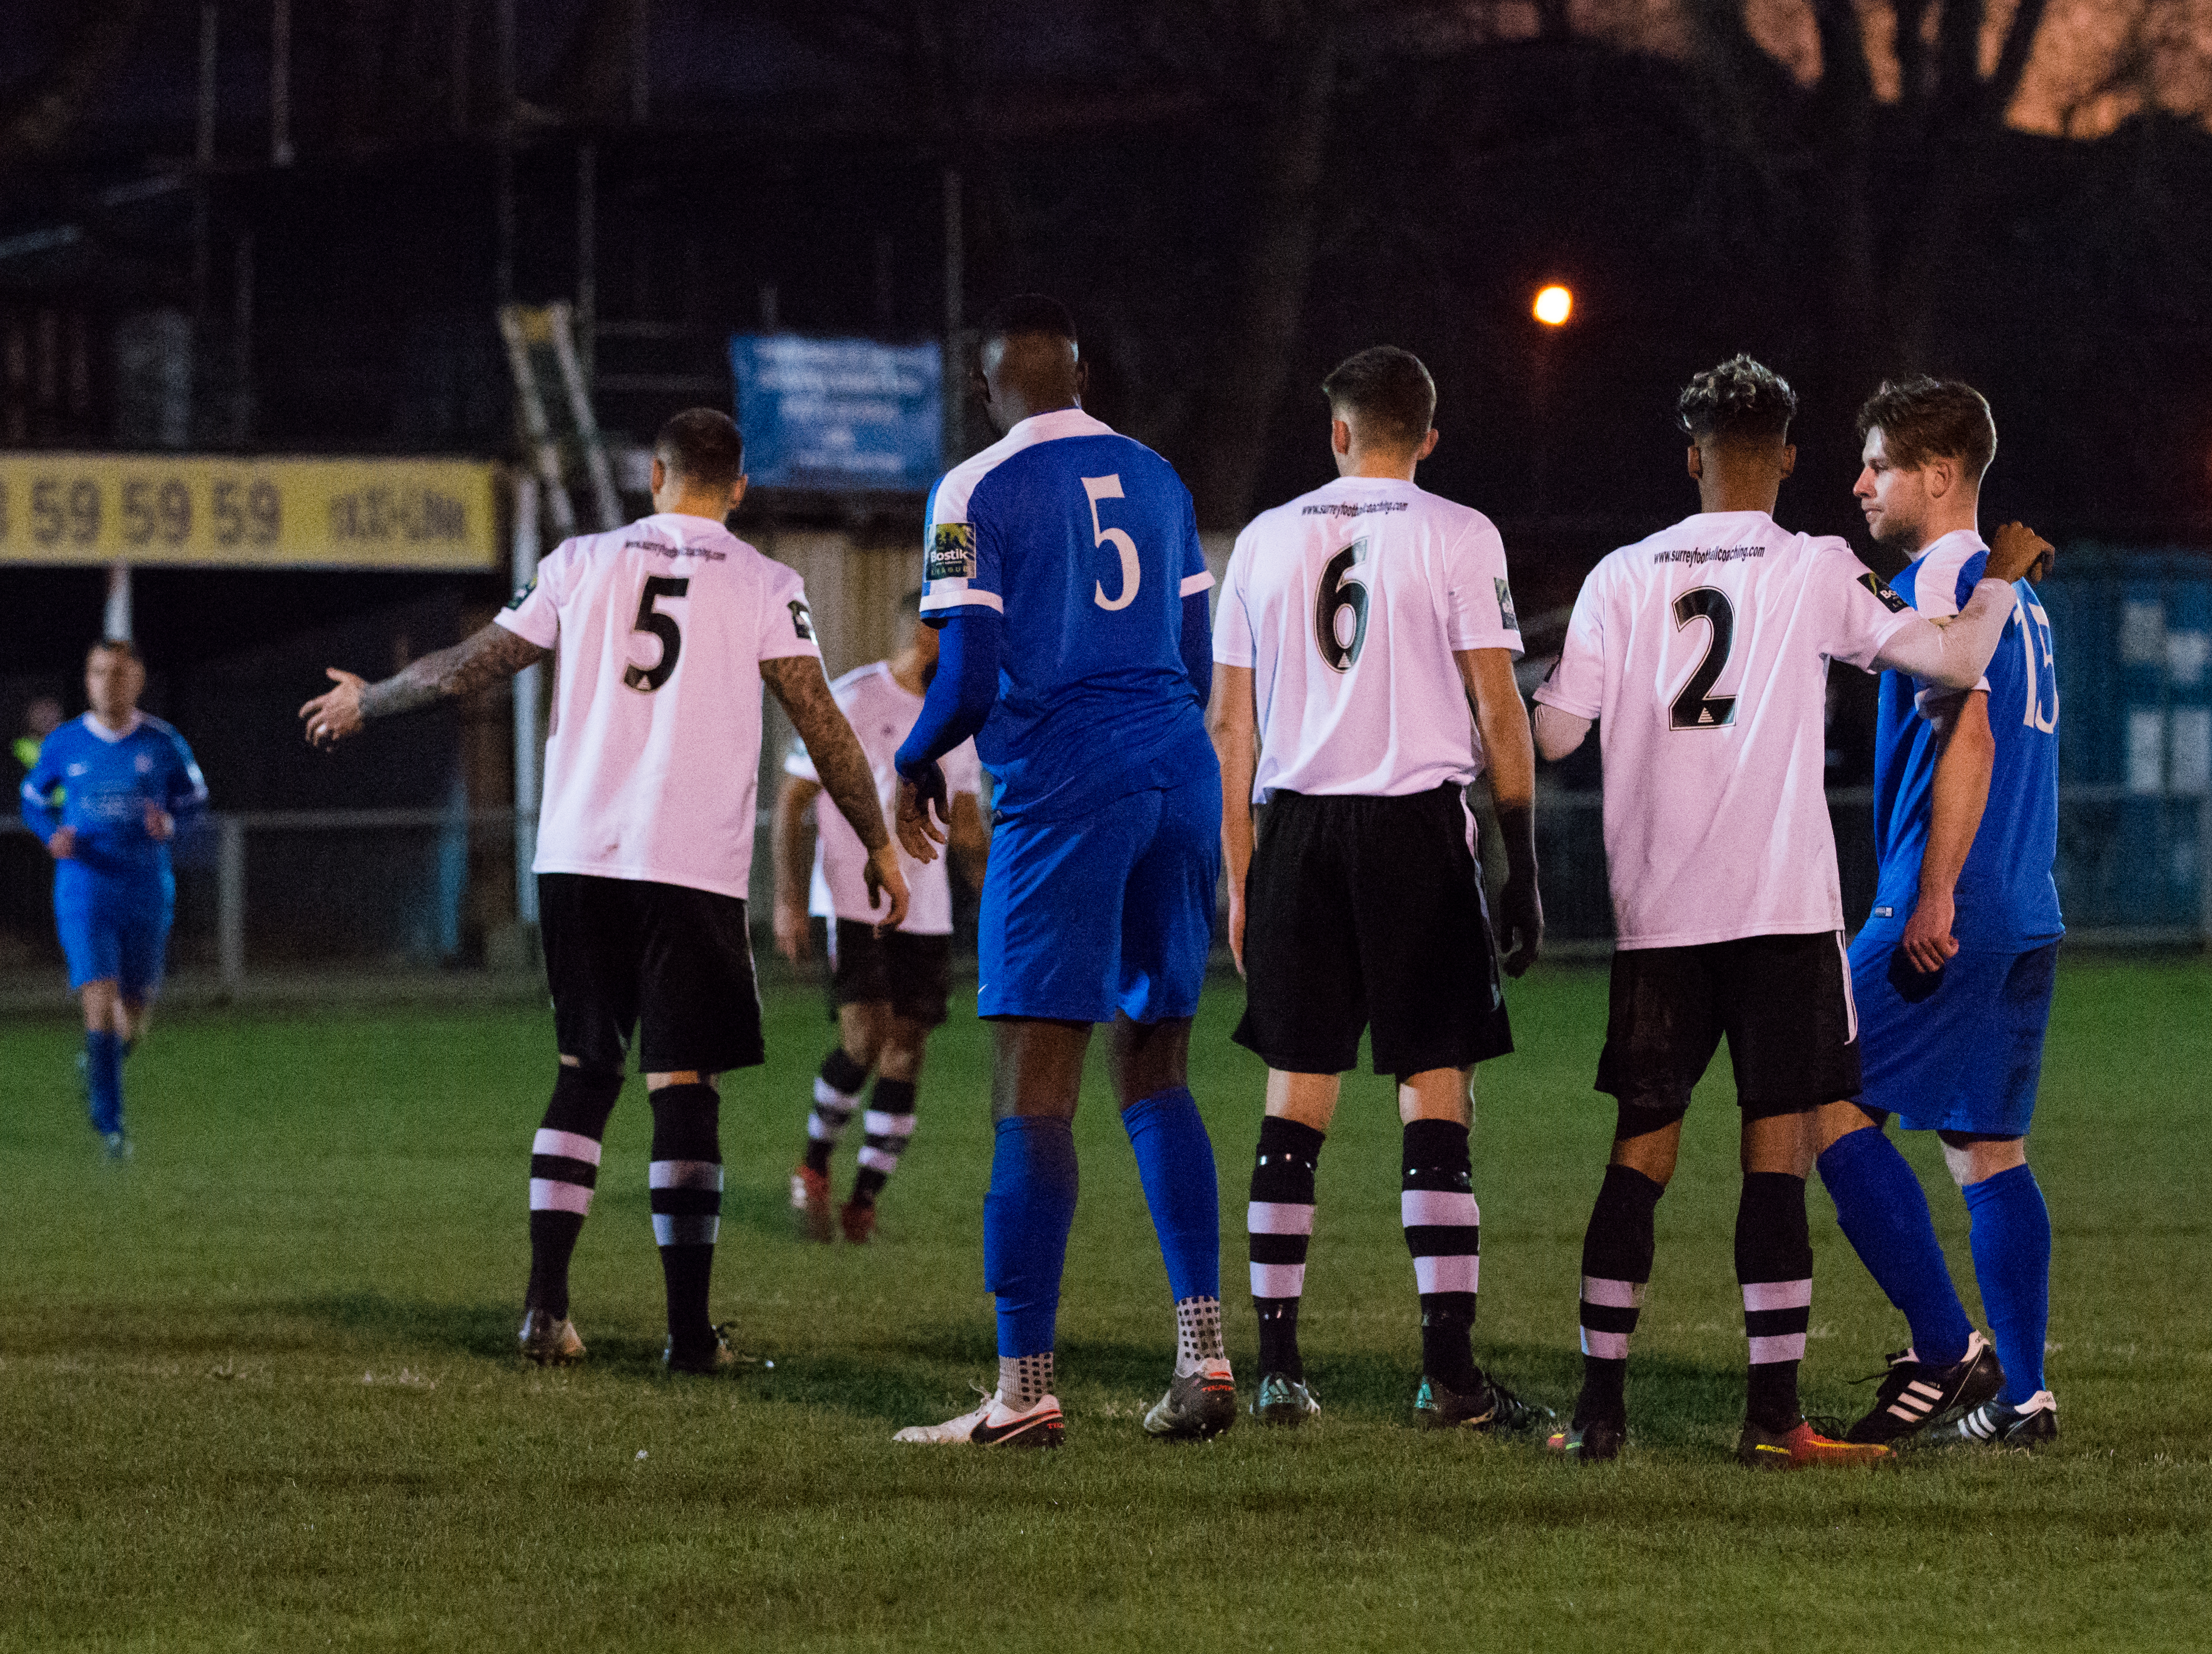 Shoreham FC vs Molesey FC 02.12.17 96